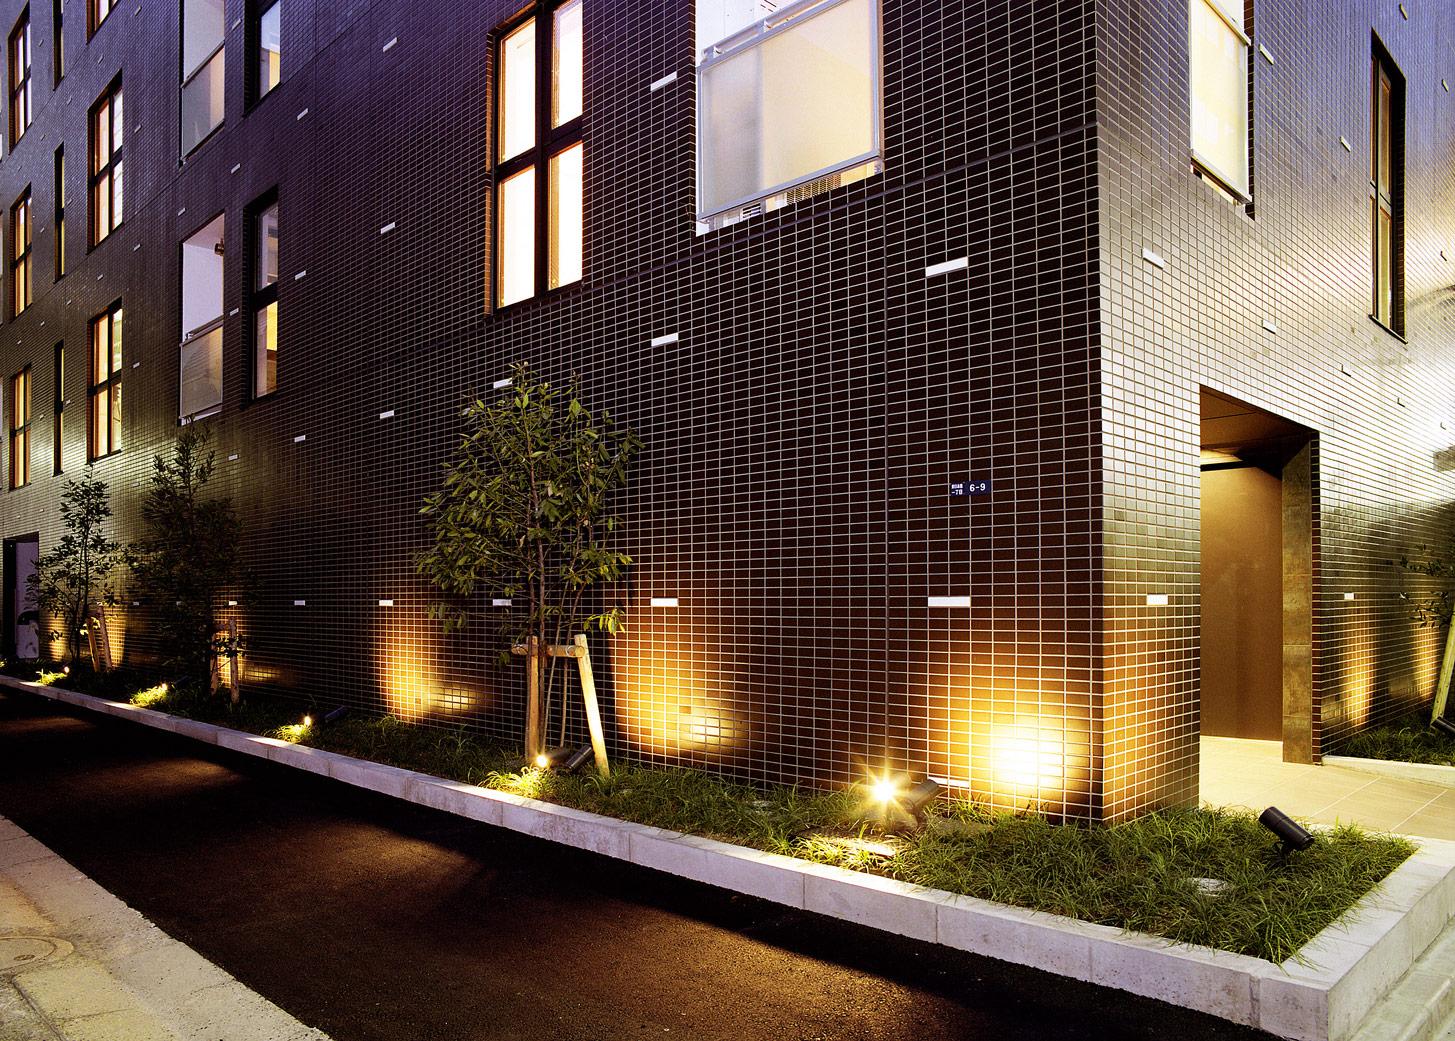 GREEN PARK 東日本橋 RESIDENCE ll   マンションギャラリー